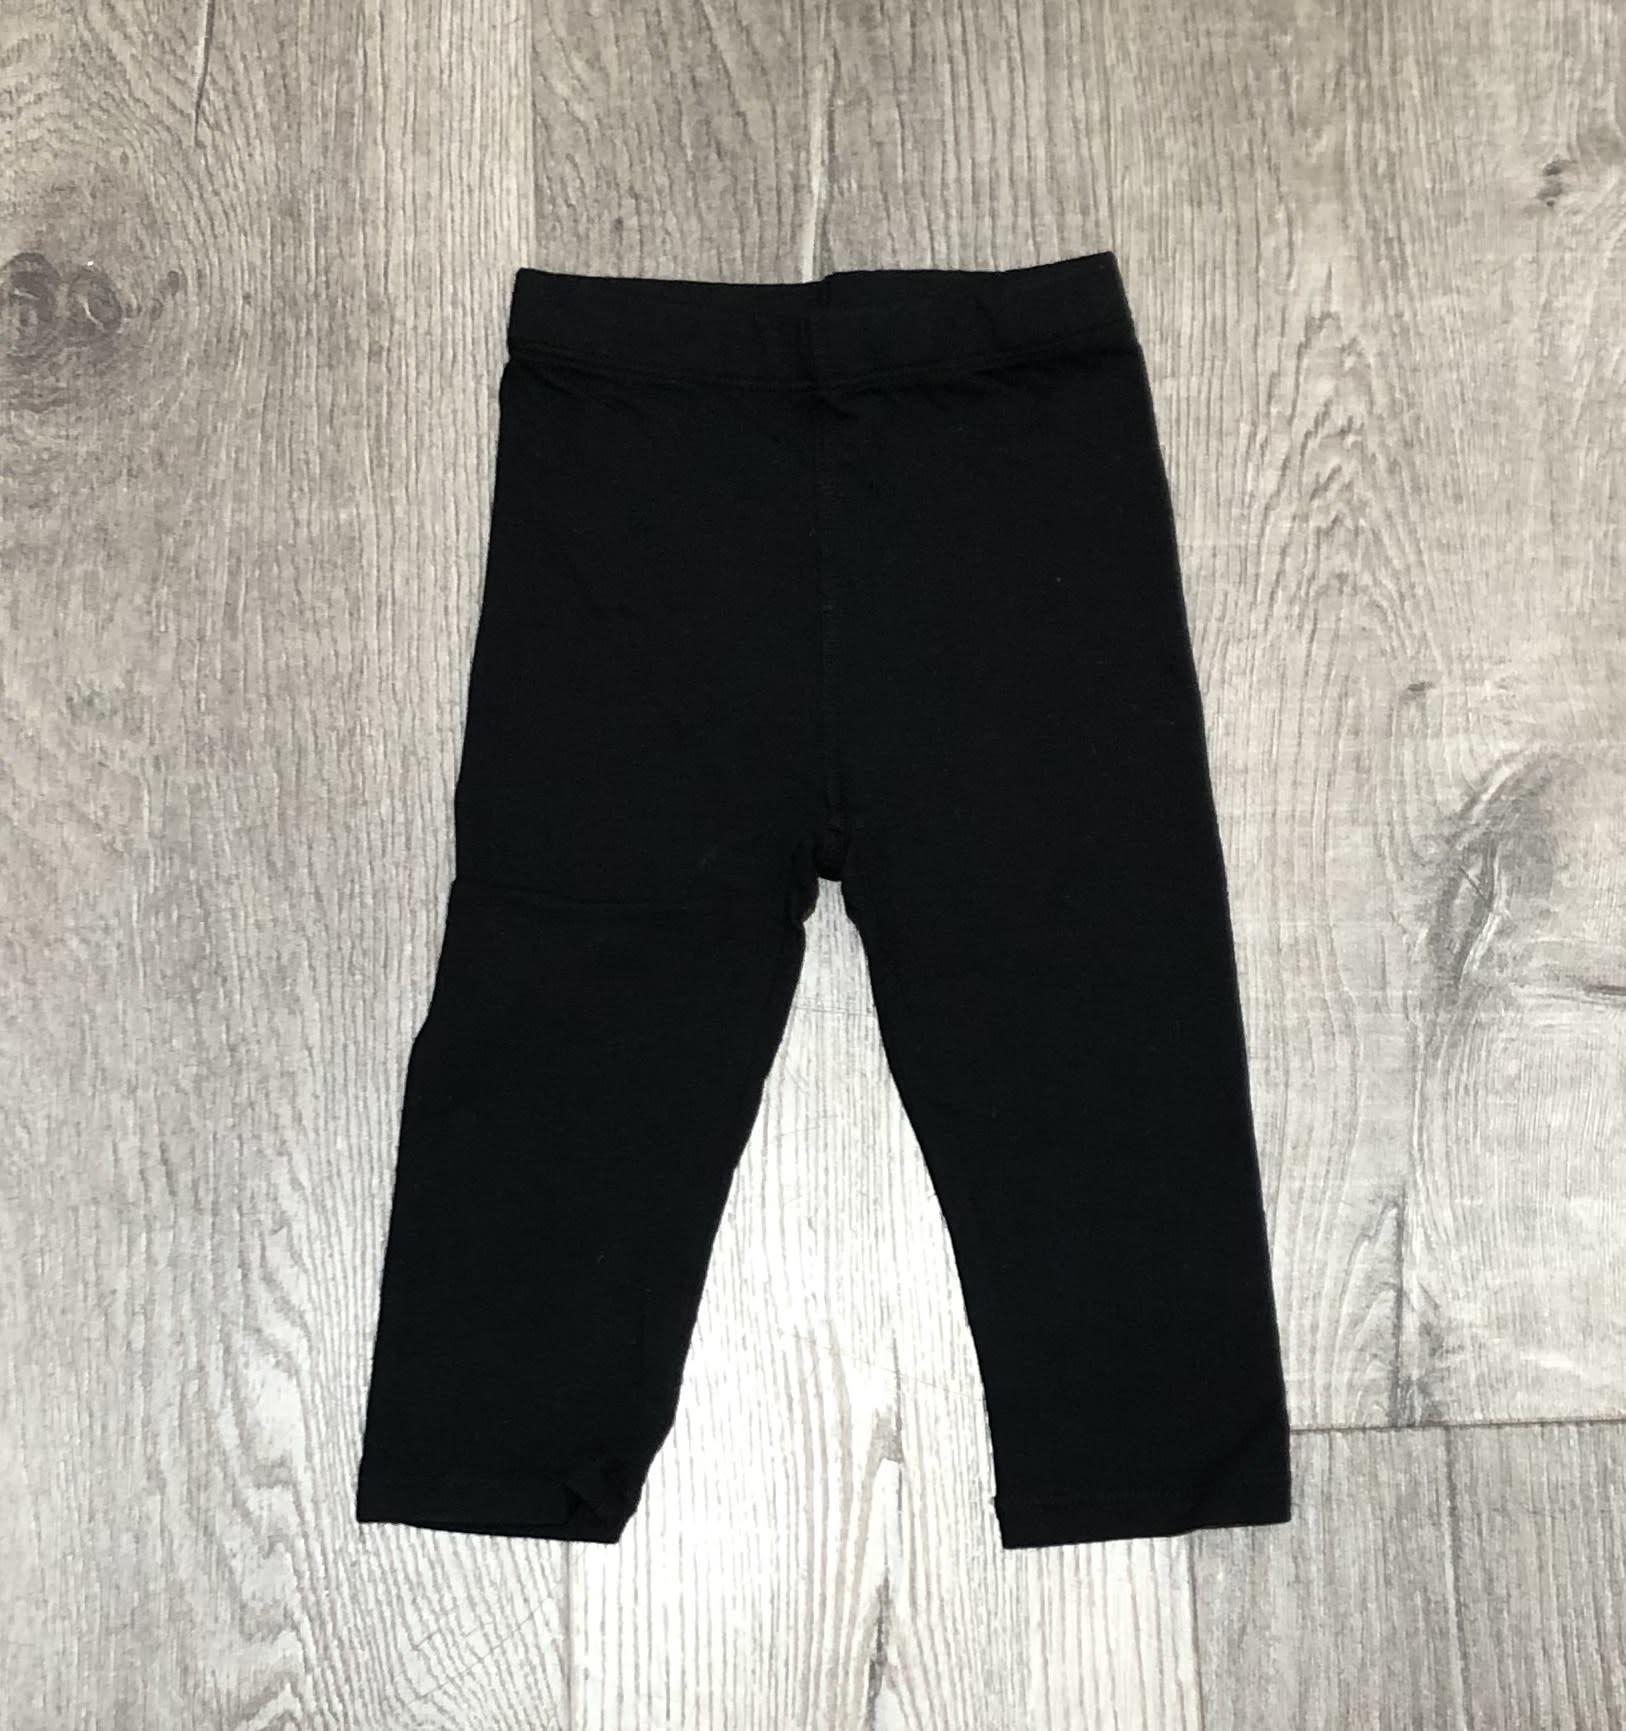 Cozii Baby Legging, Black